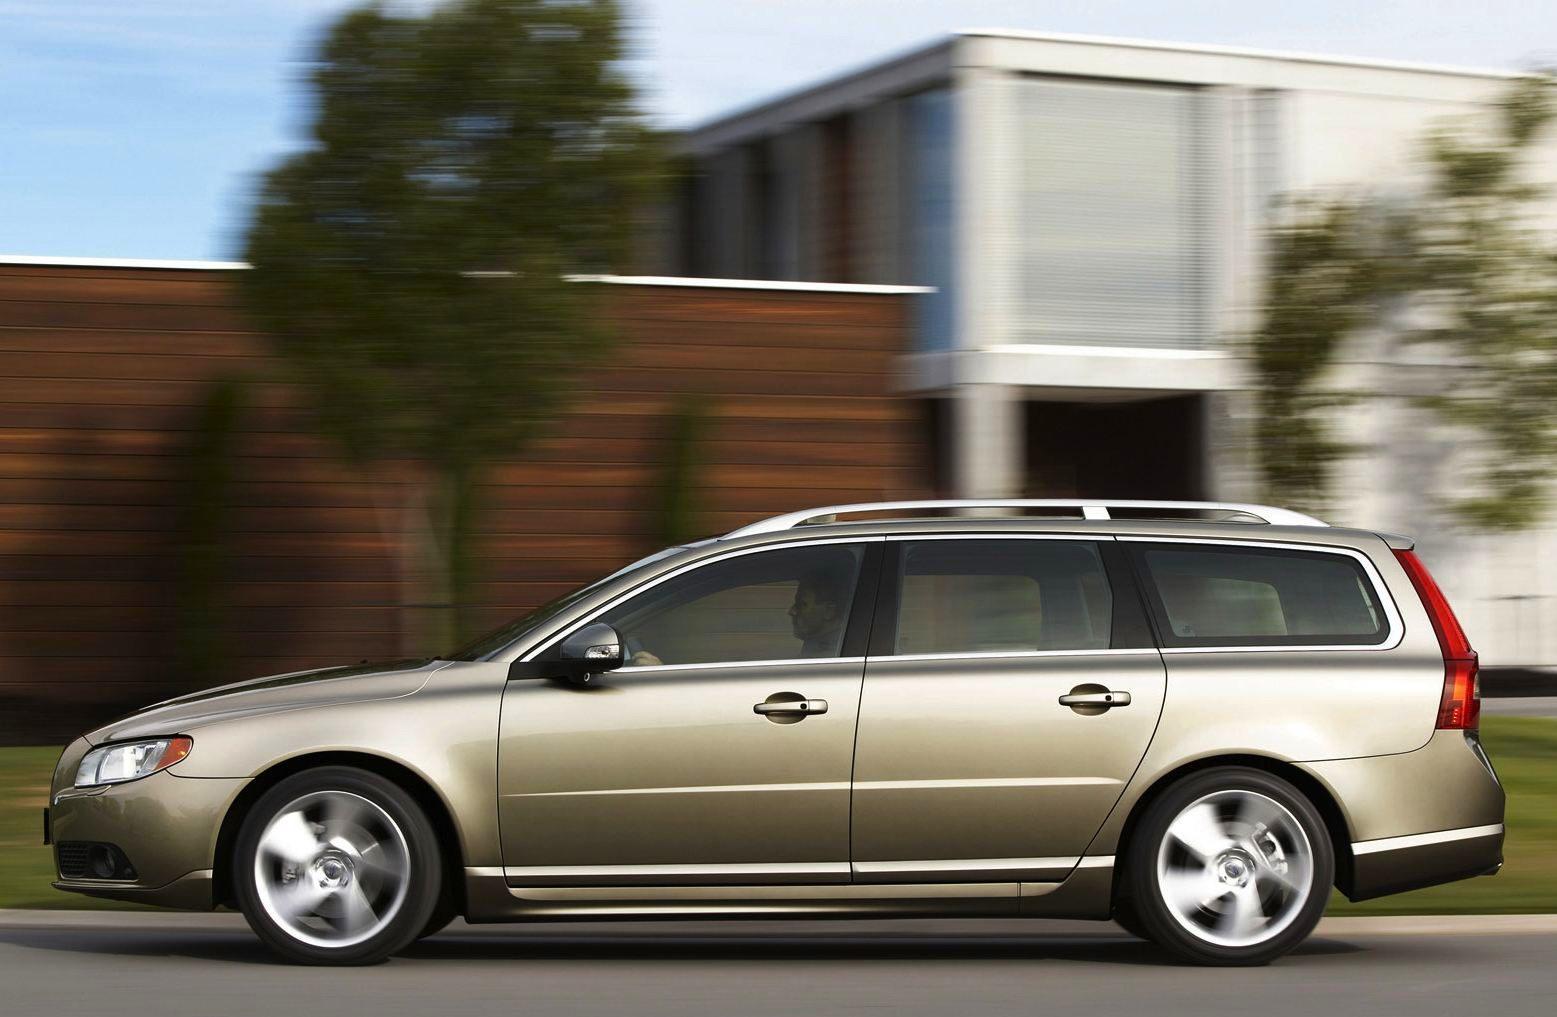 Sweden 2008: new Volvo V70 #1, Saab 9-3 & V50 on podium – Best Selling Cars Blog